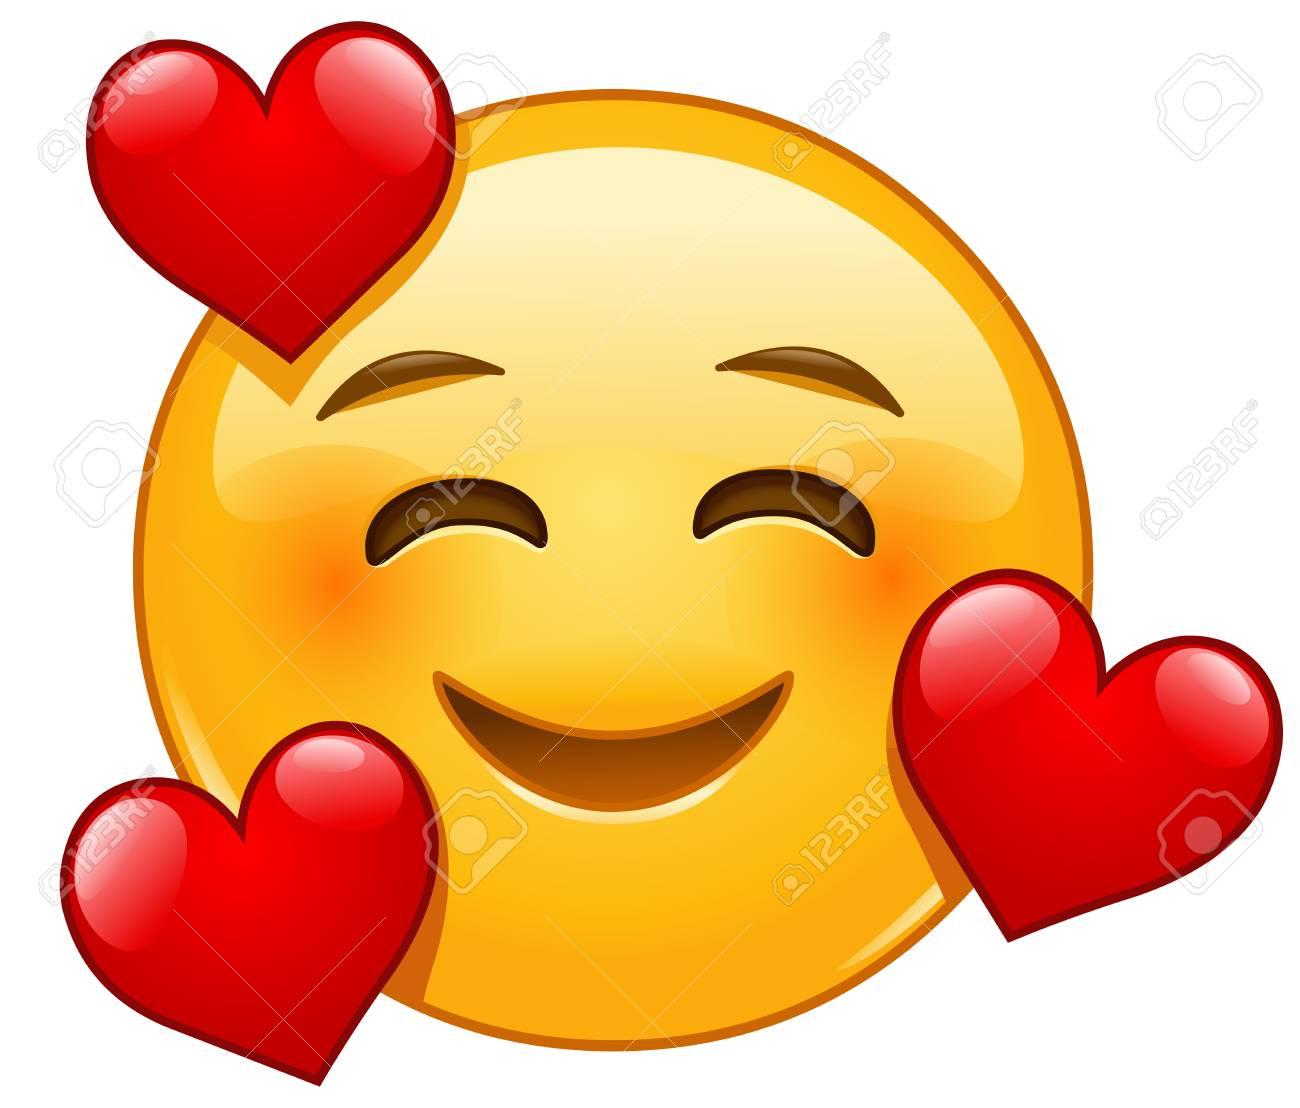 Smiling face with three hearts emoji emoticon - 123650142